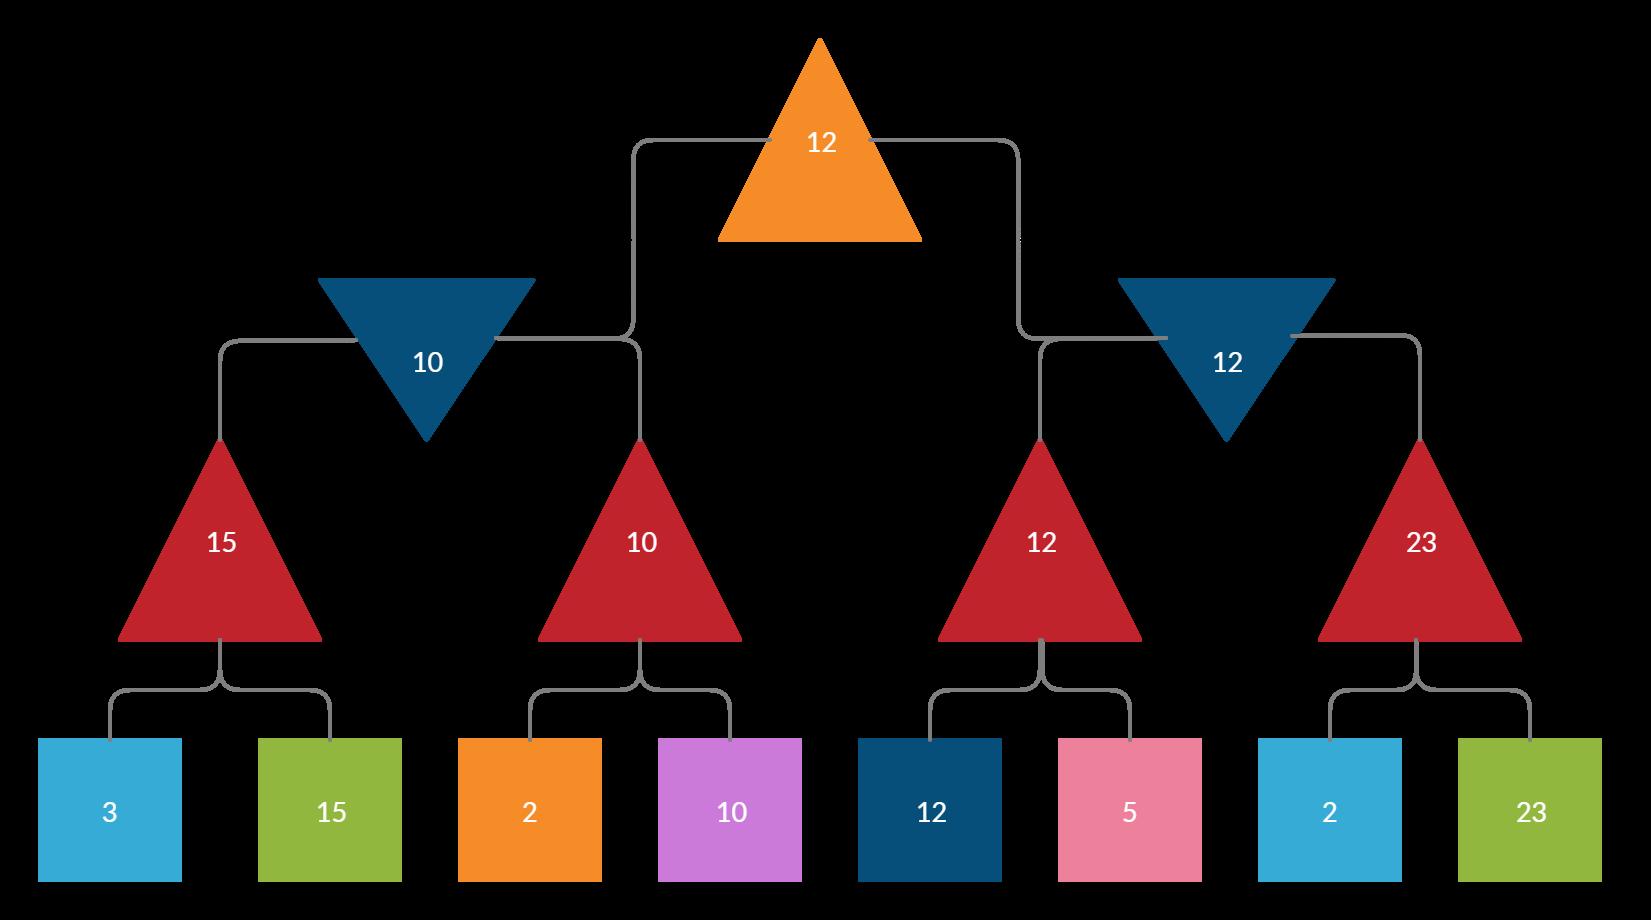 An illustration of the Minimax Algorithm